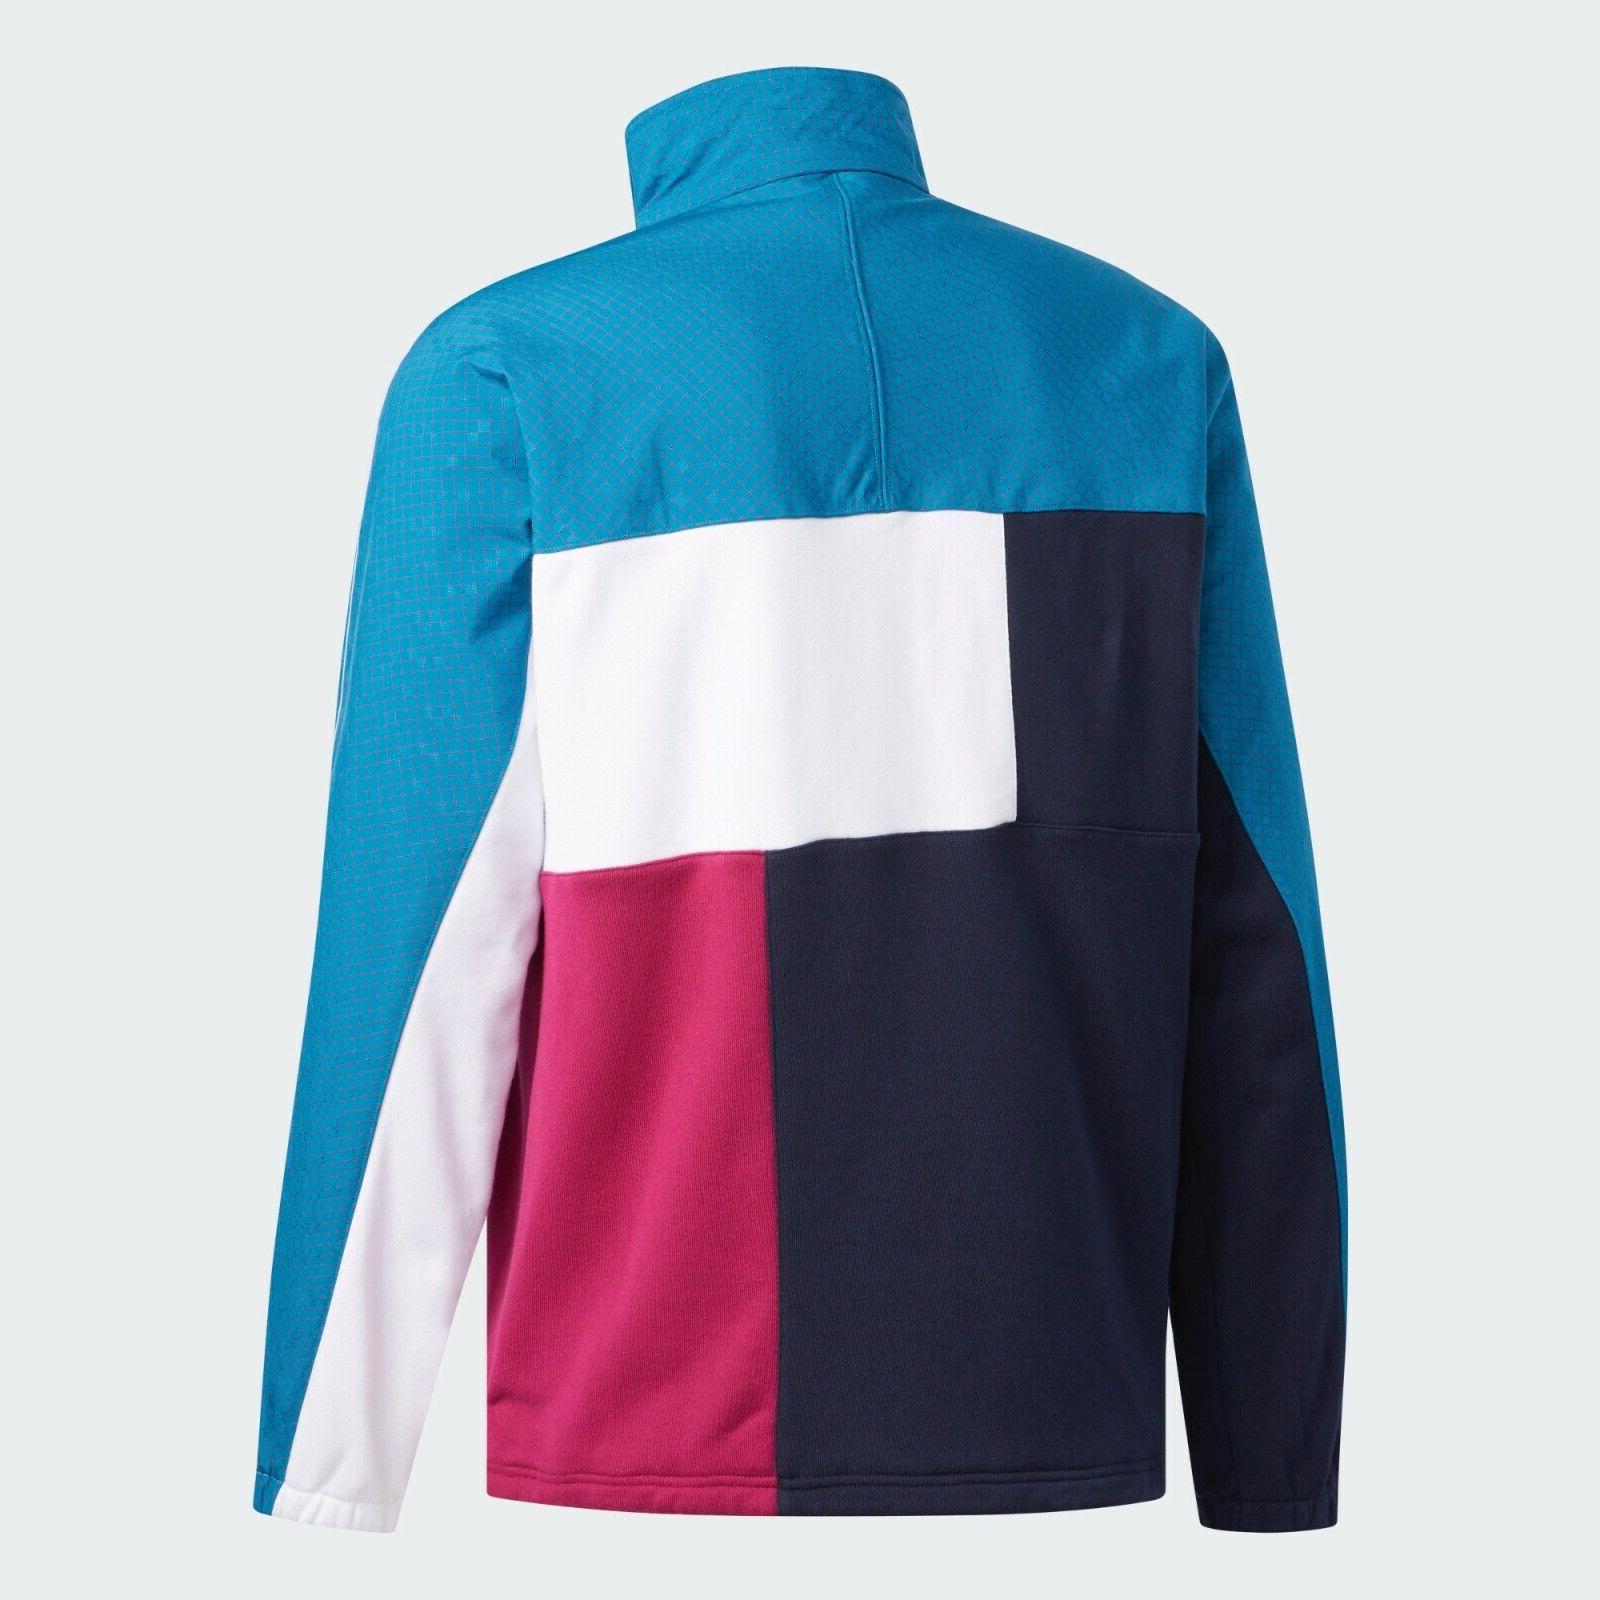 Men's Adidas Originals Full-Zip Track Jacket M - NWT $100